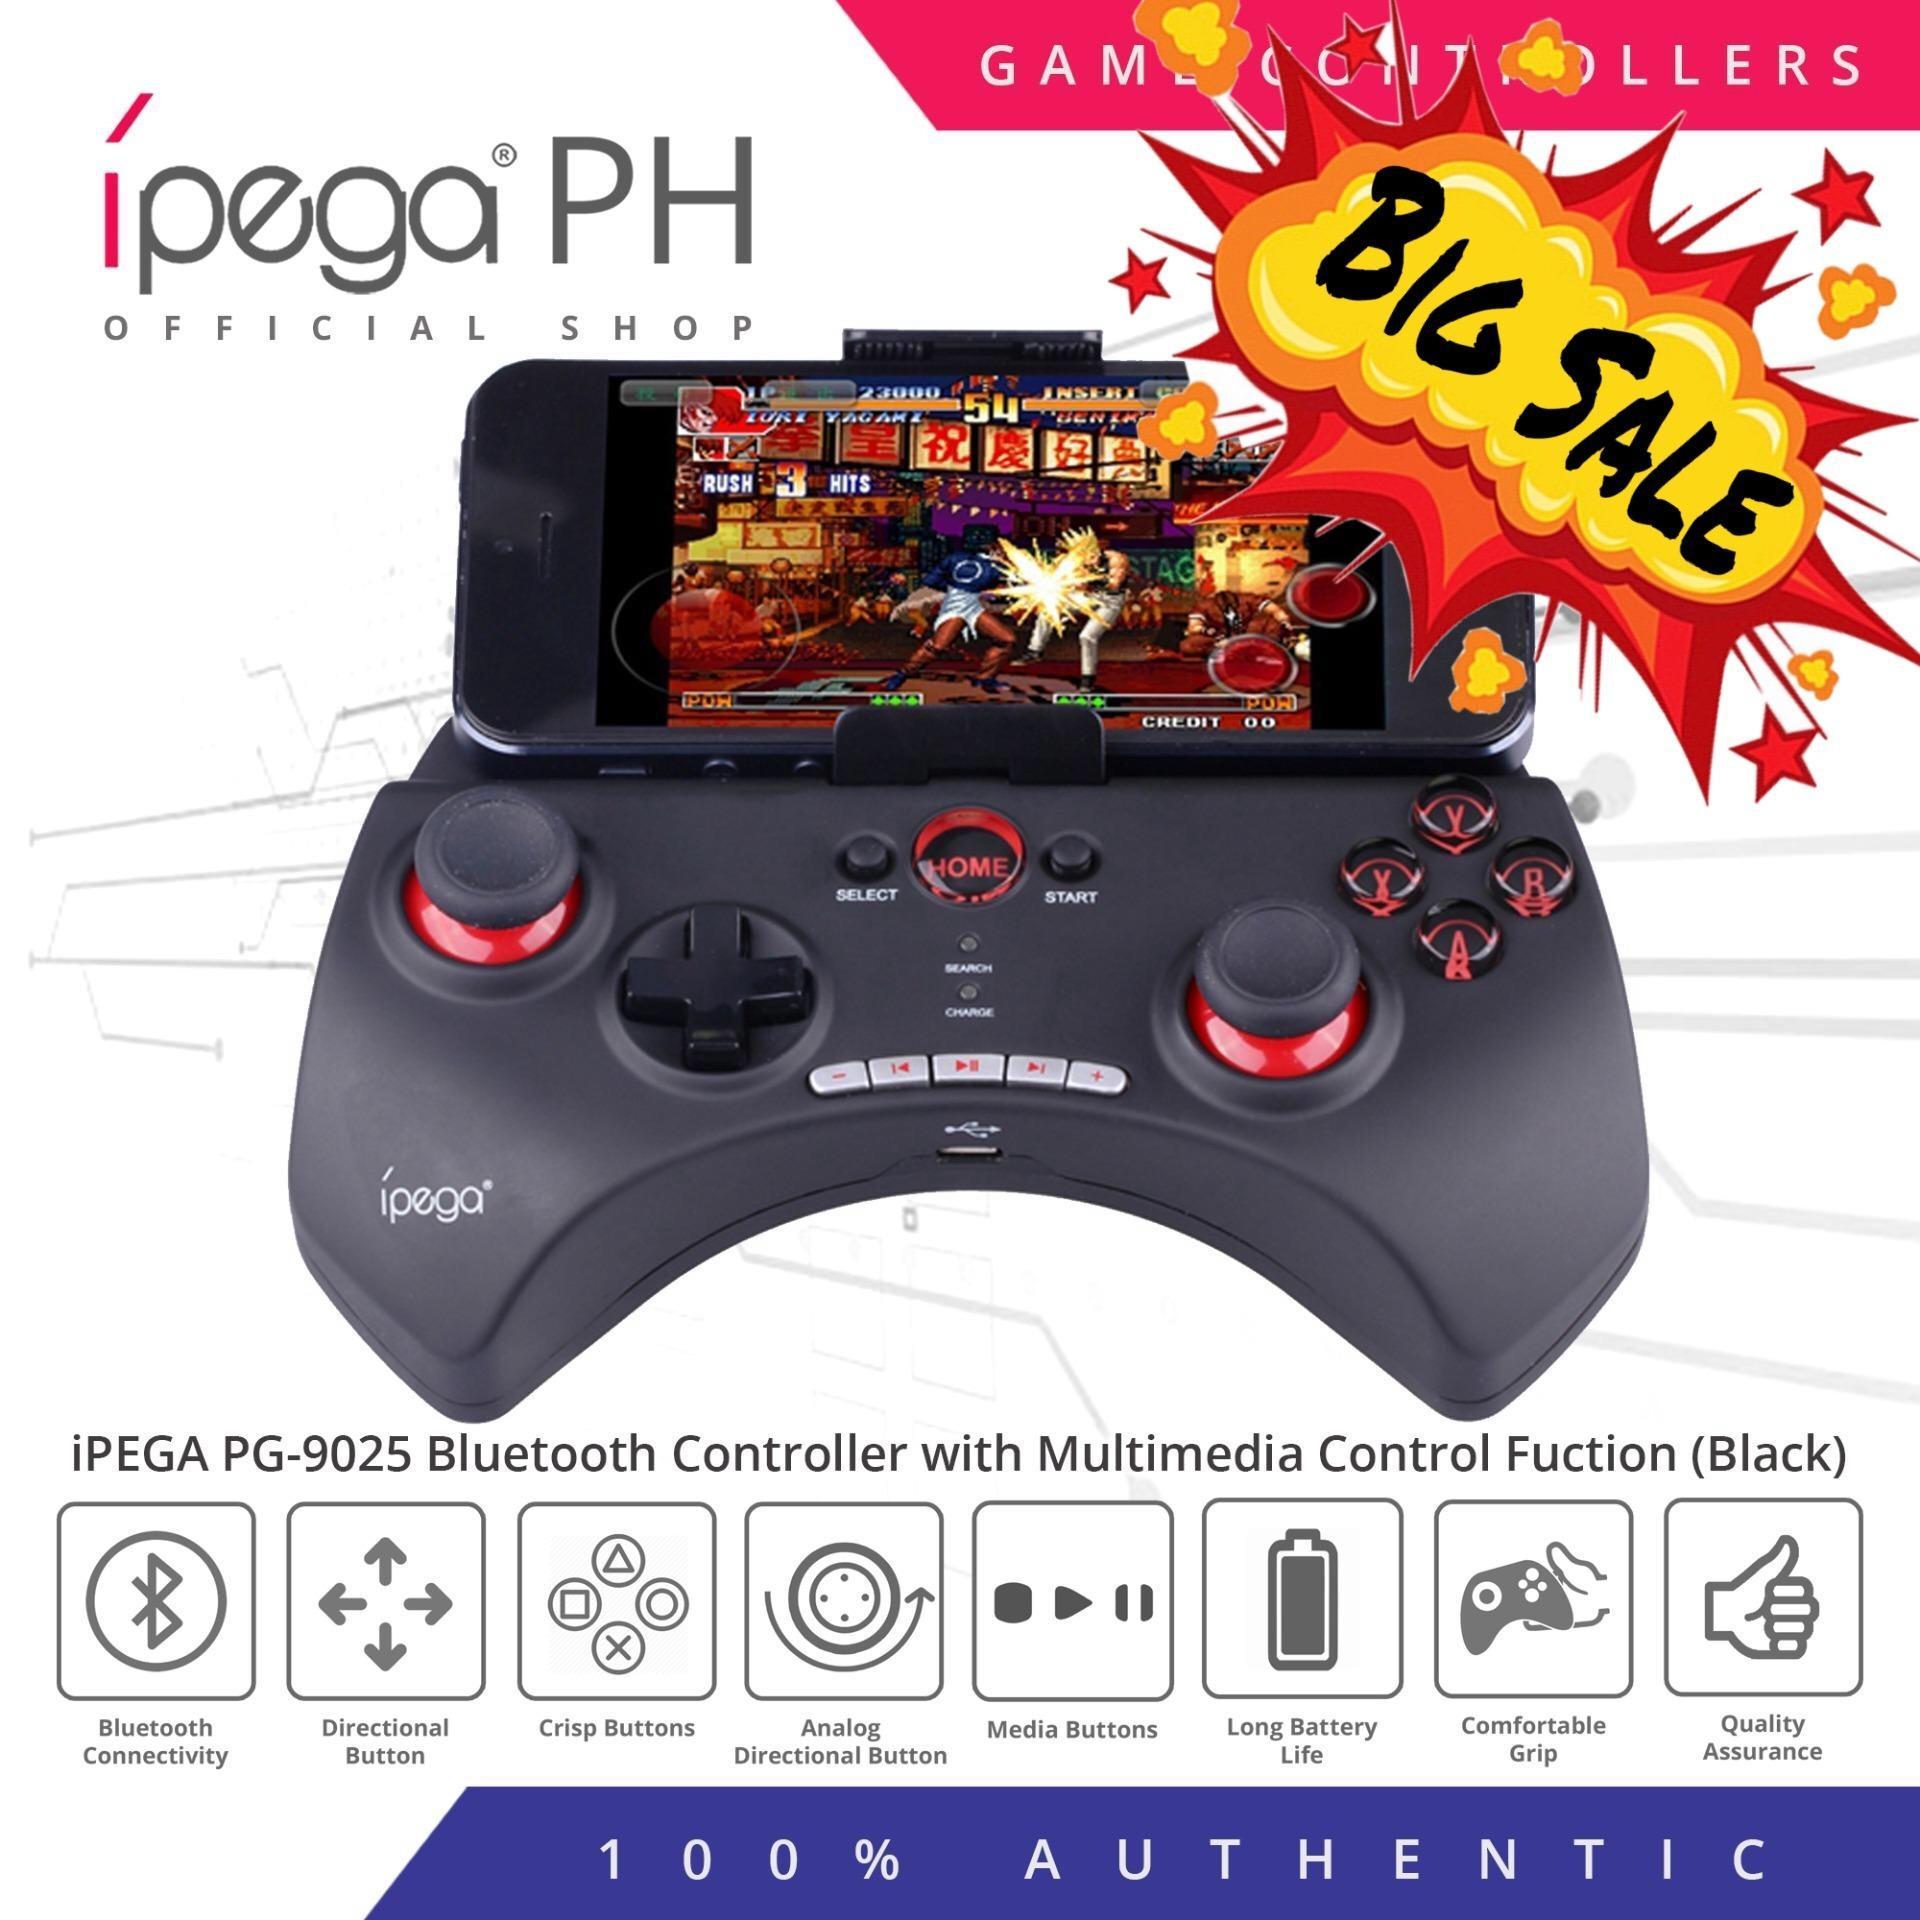 iPega PG-9025 Bluetooth Controller with Multimedia Control Fuction